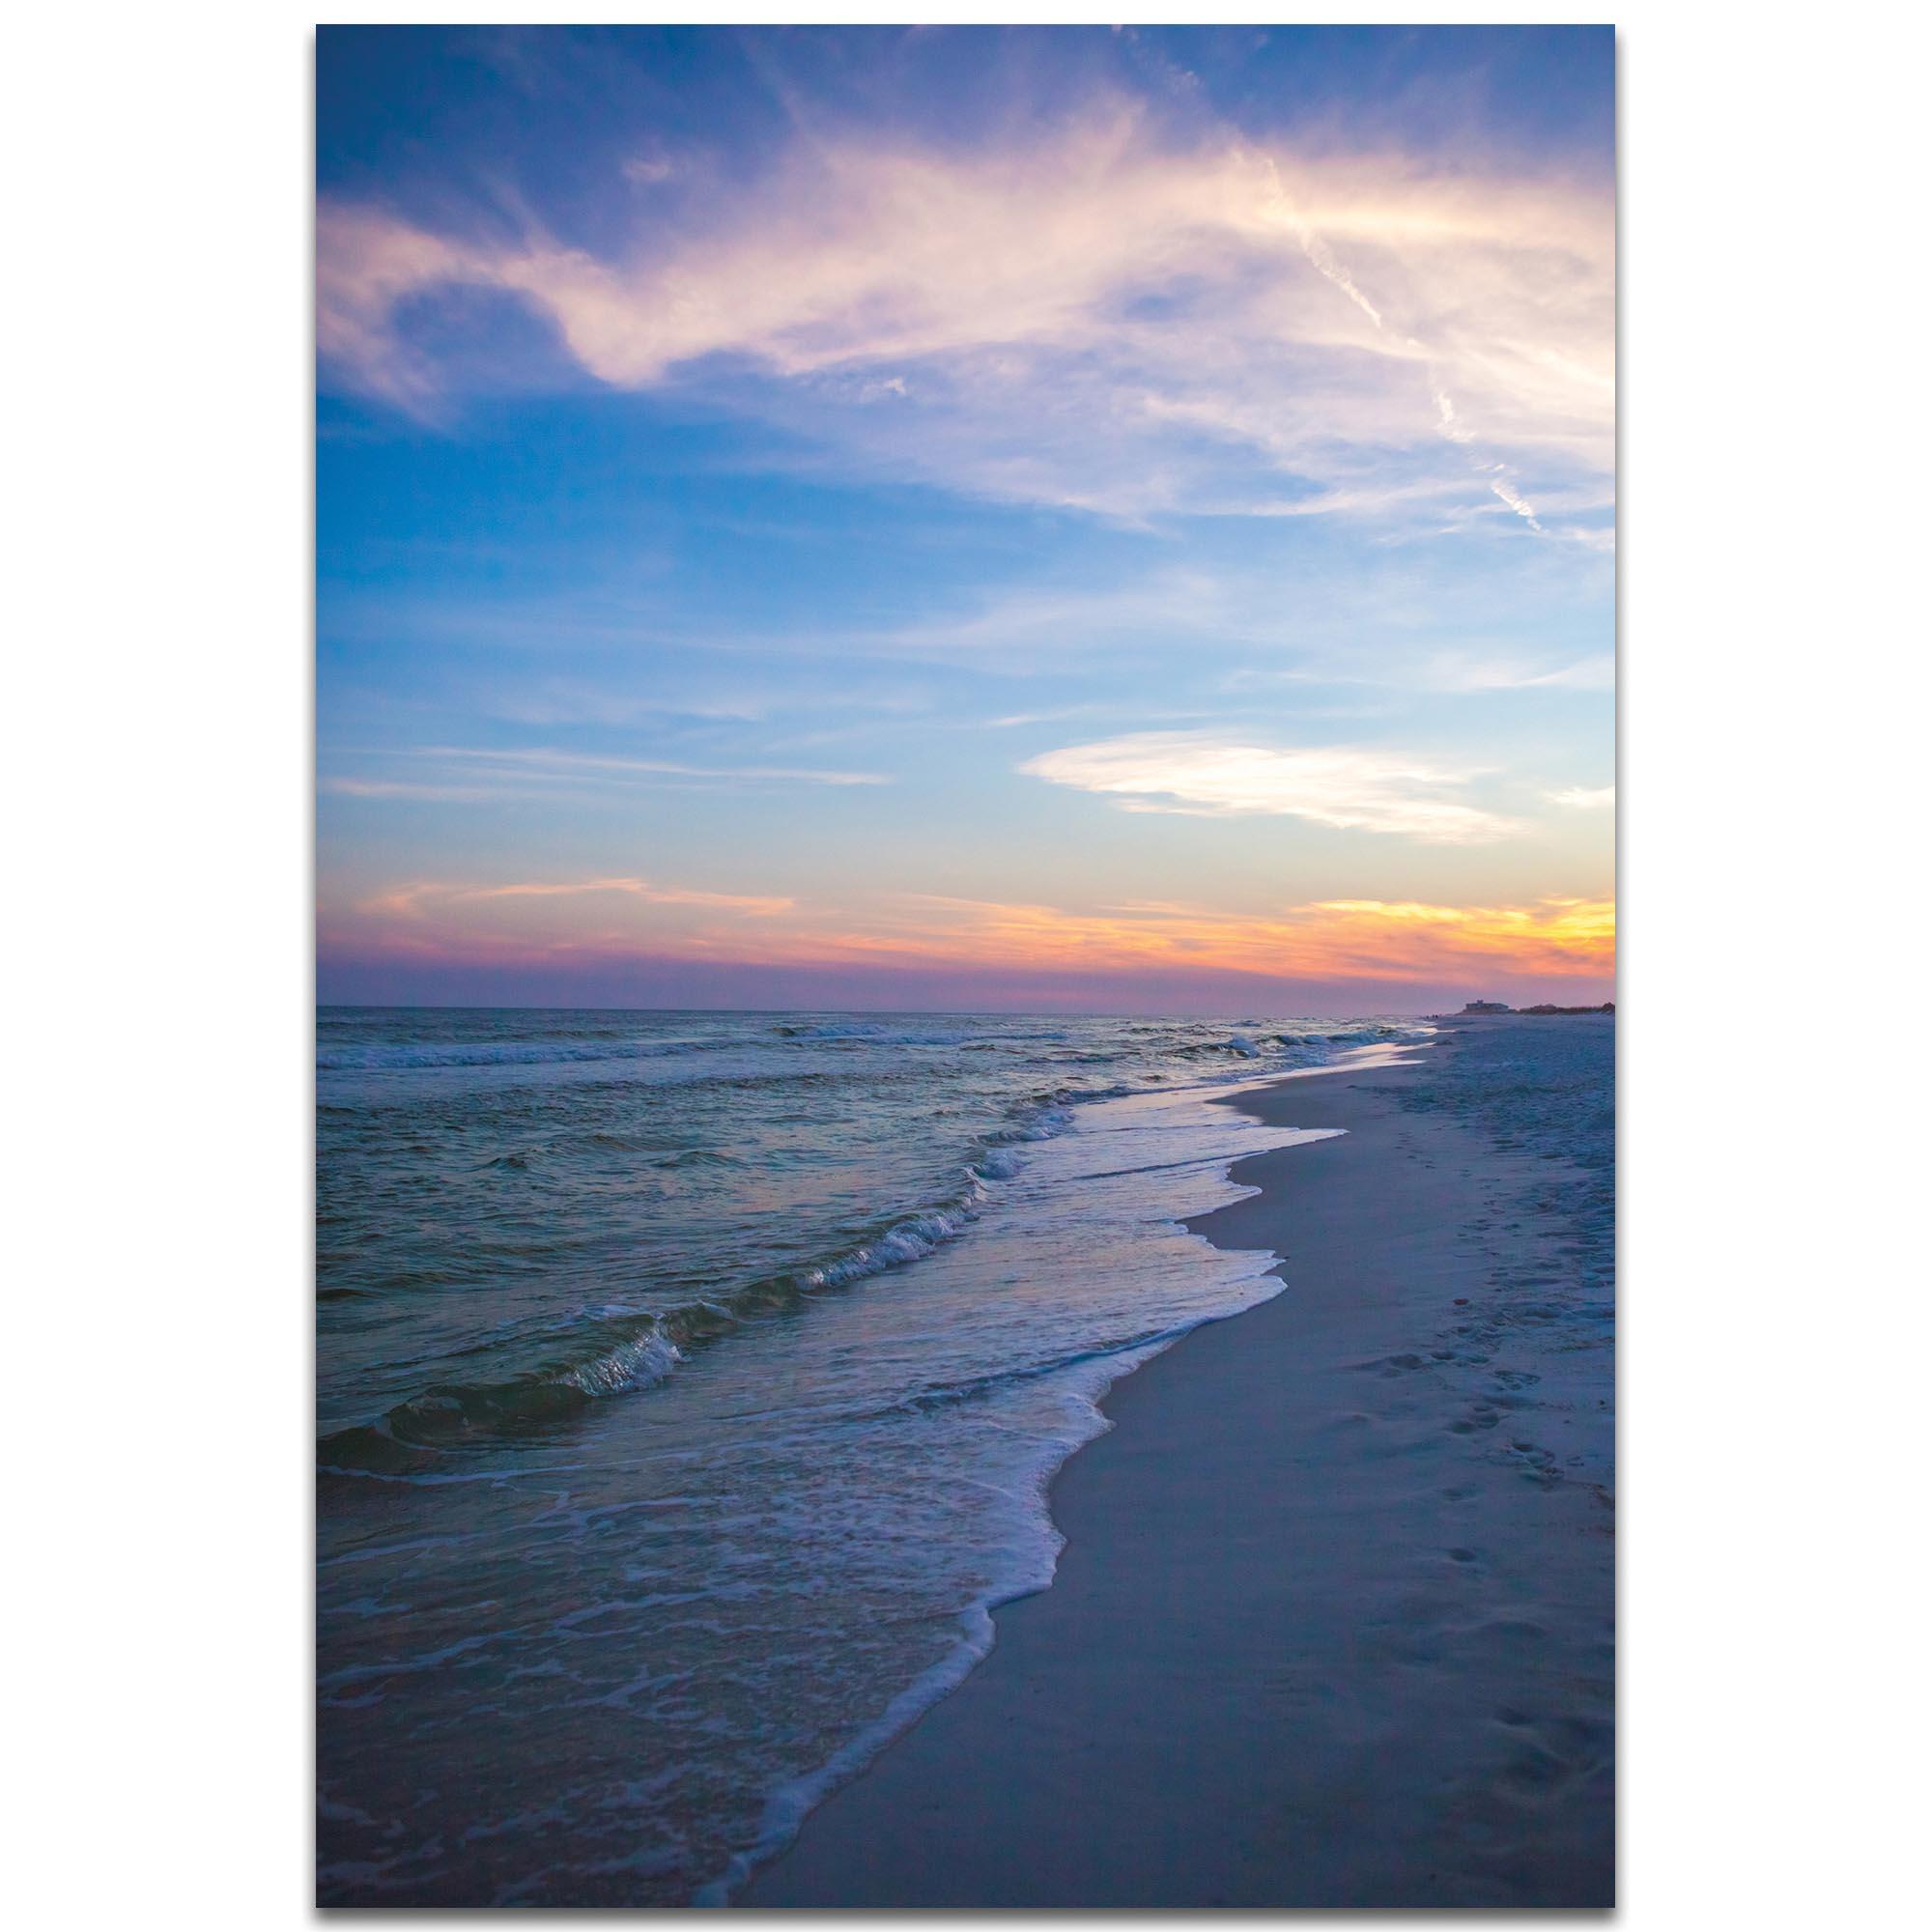 Coastal Wall Art 'Sunset Shores' - Romantic Sunset Decor on Metal or Plexiglass